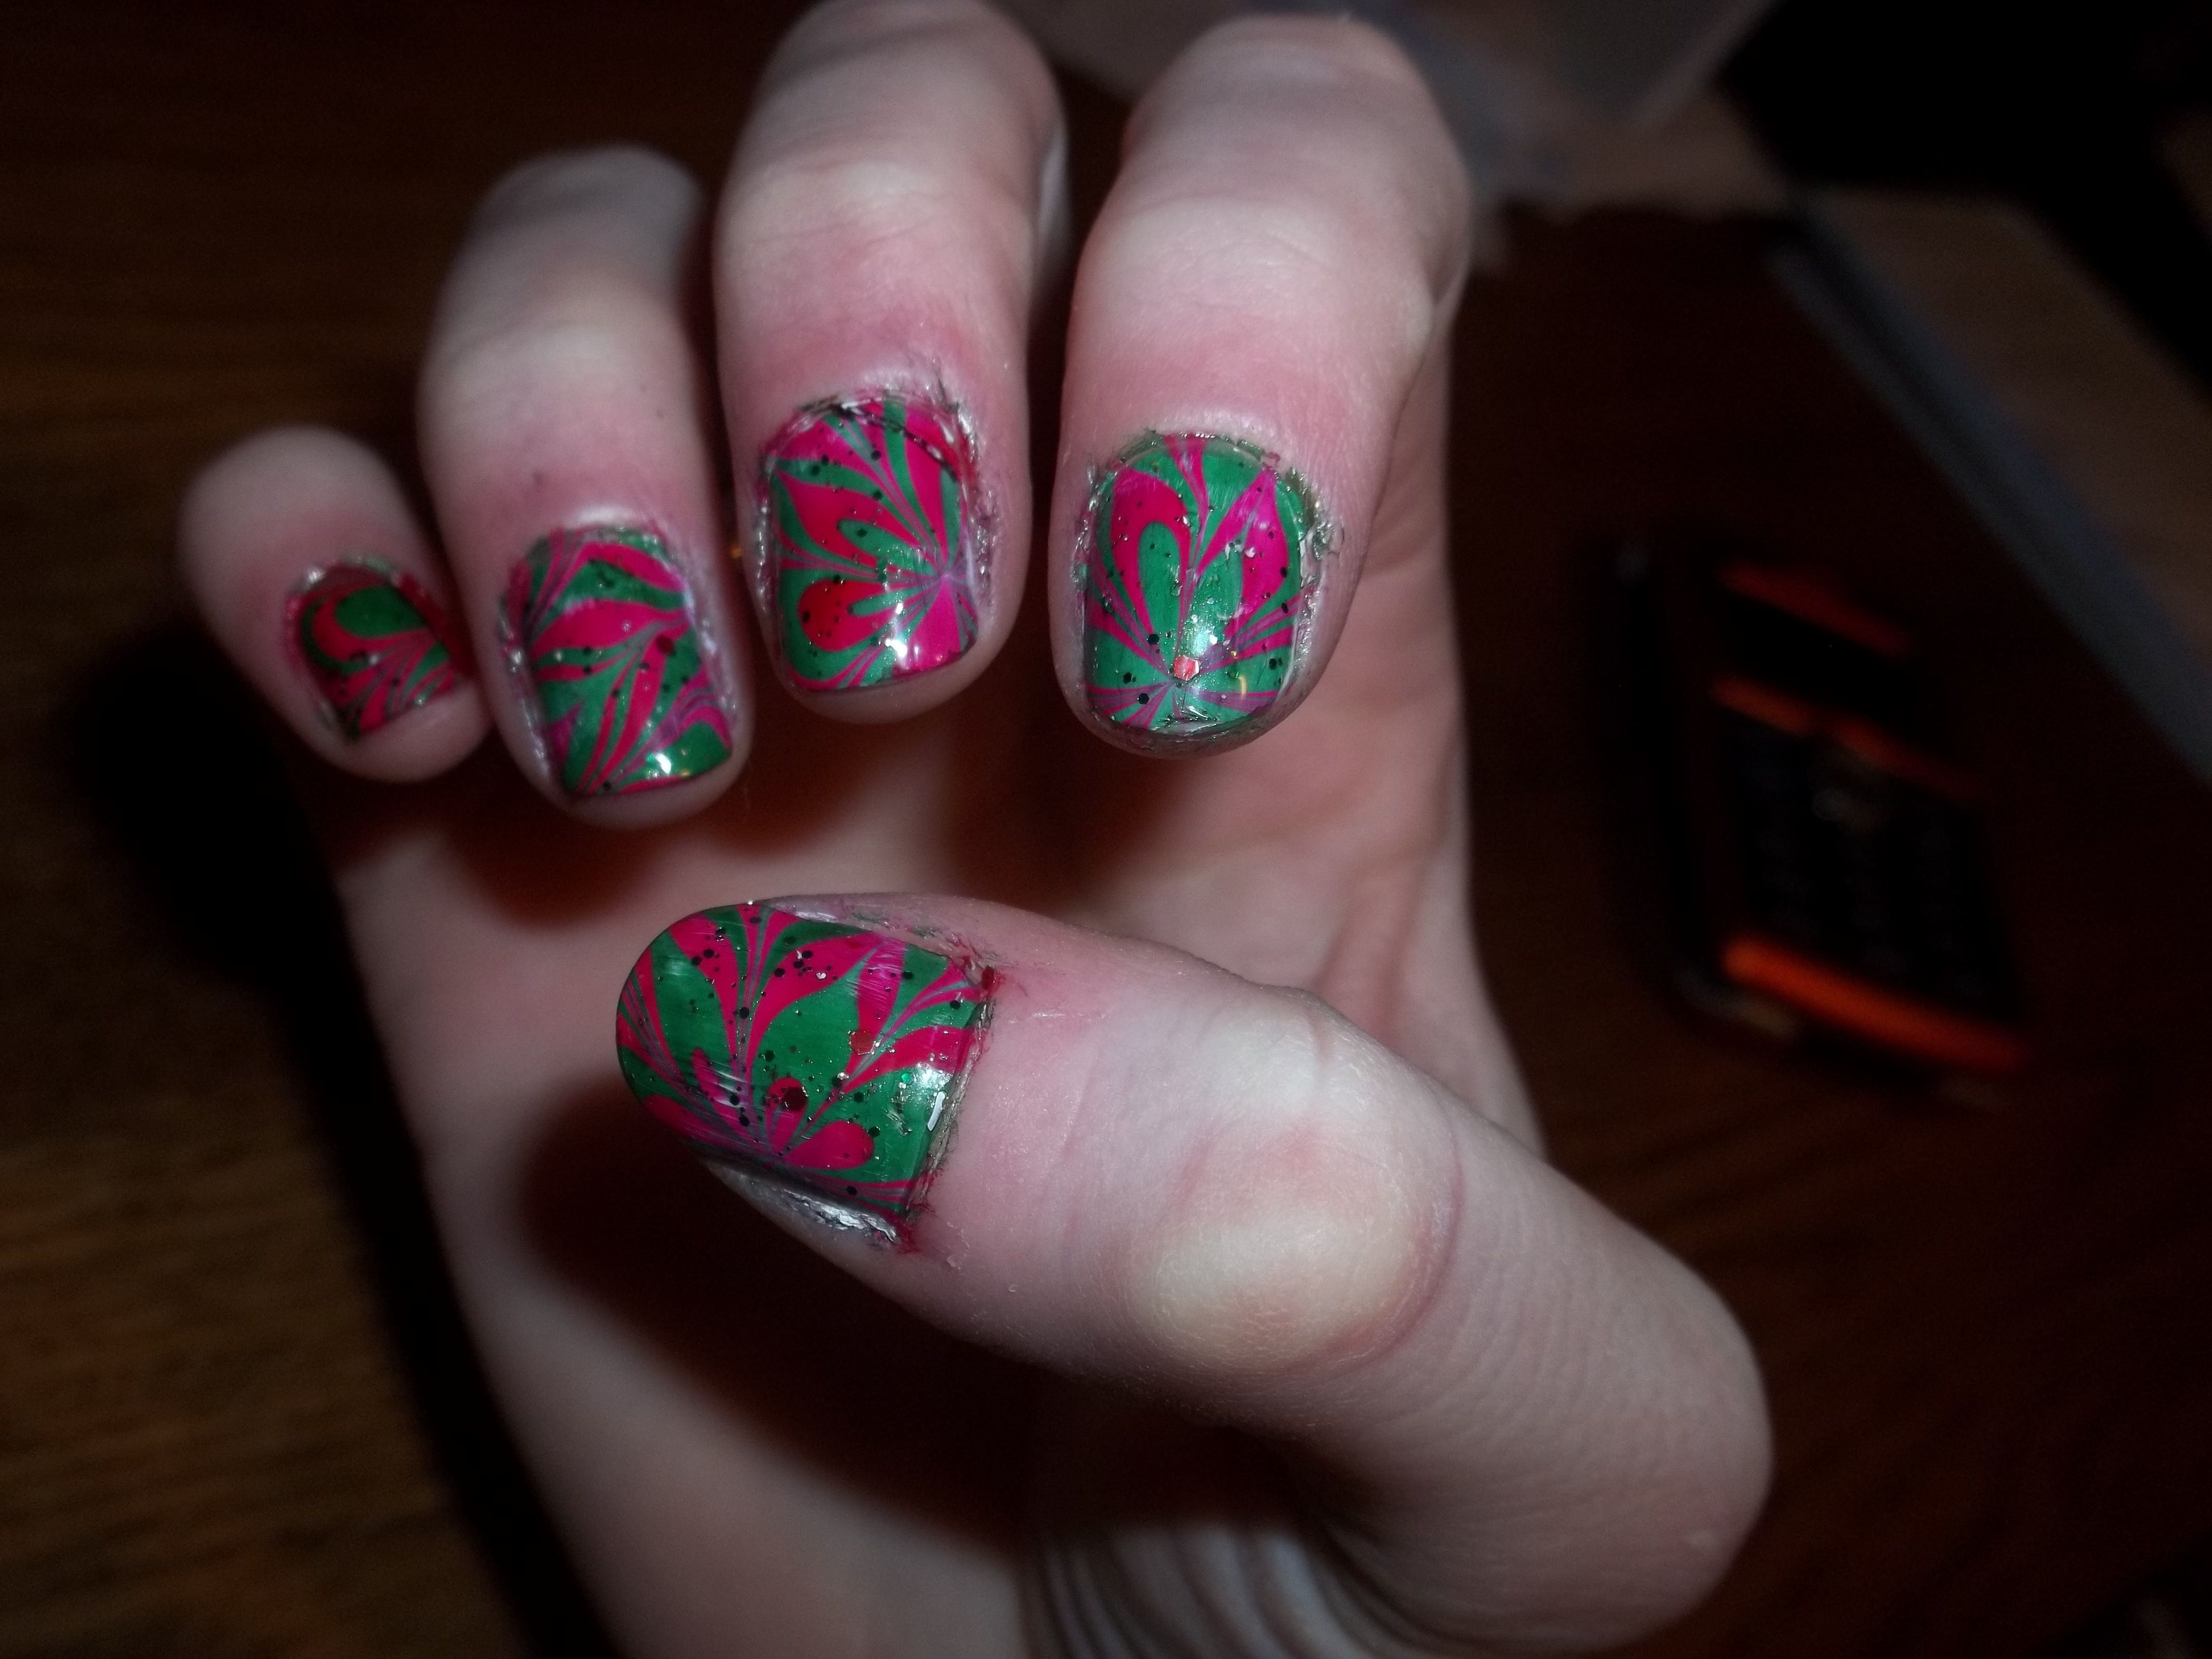 poinsettia marble nails